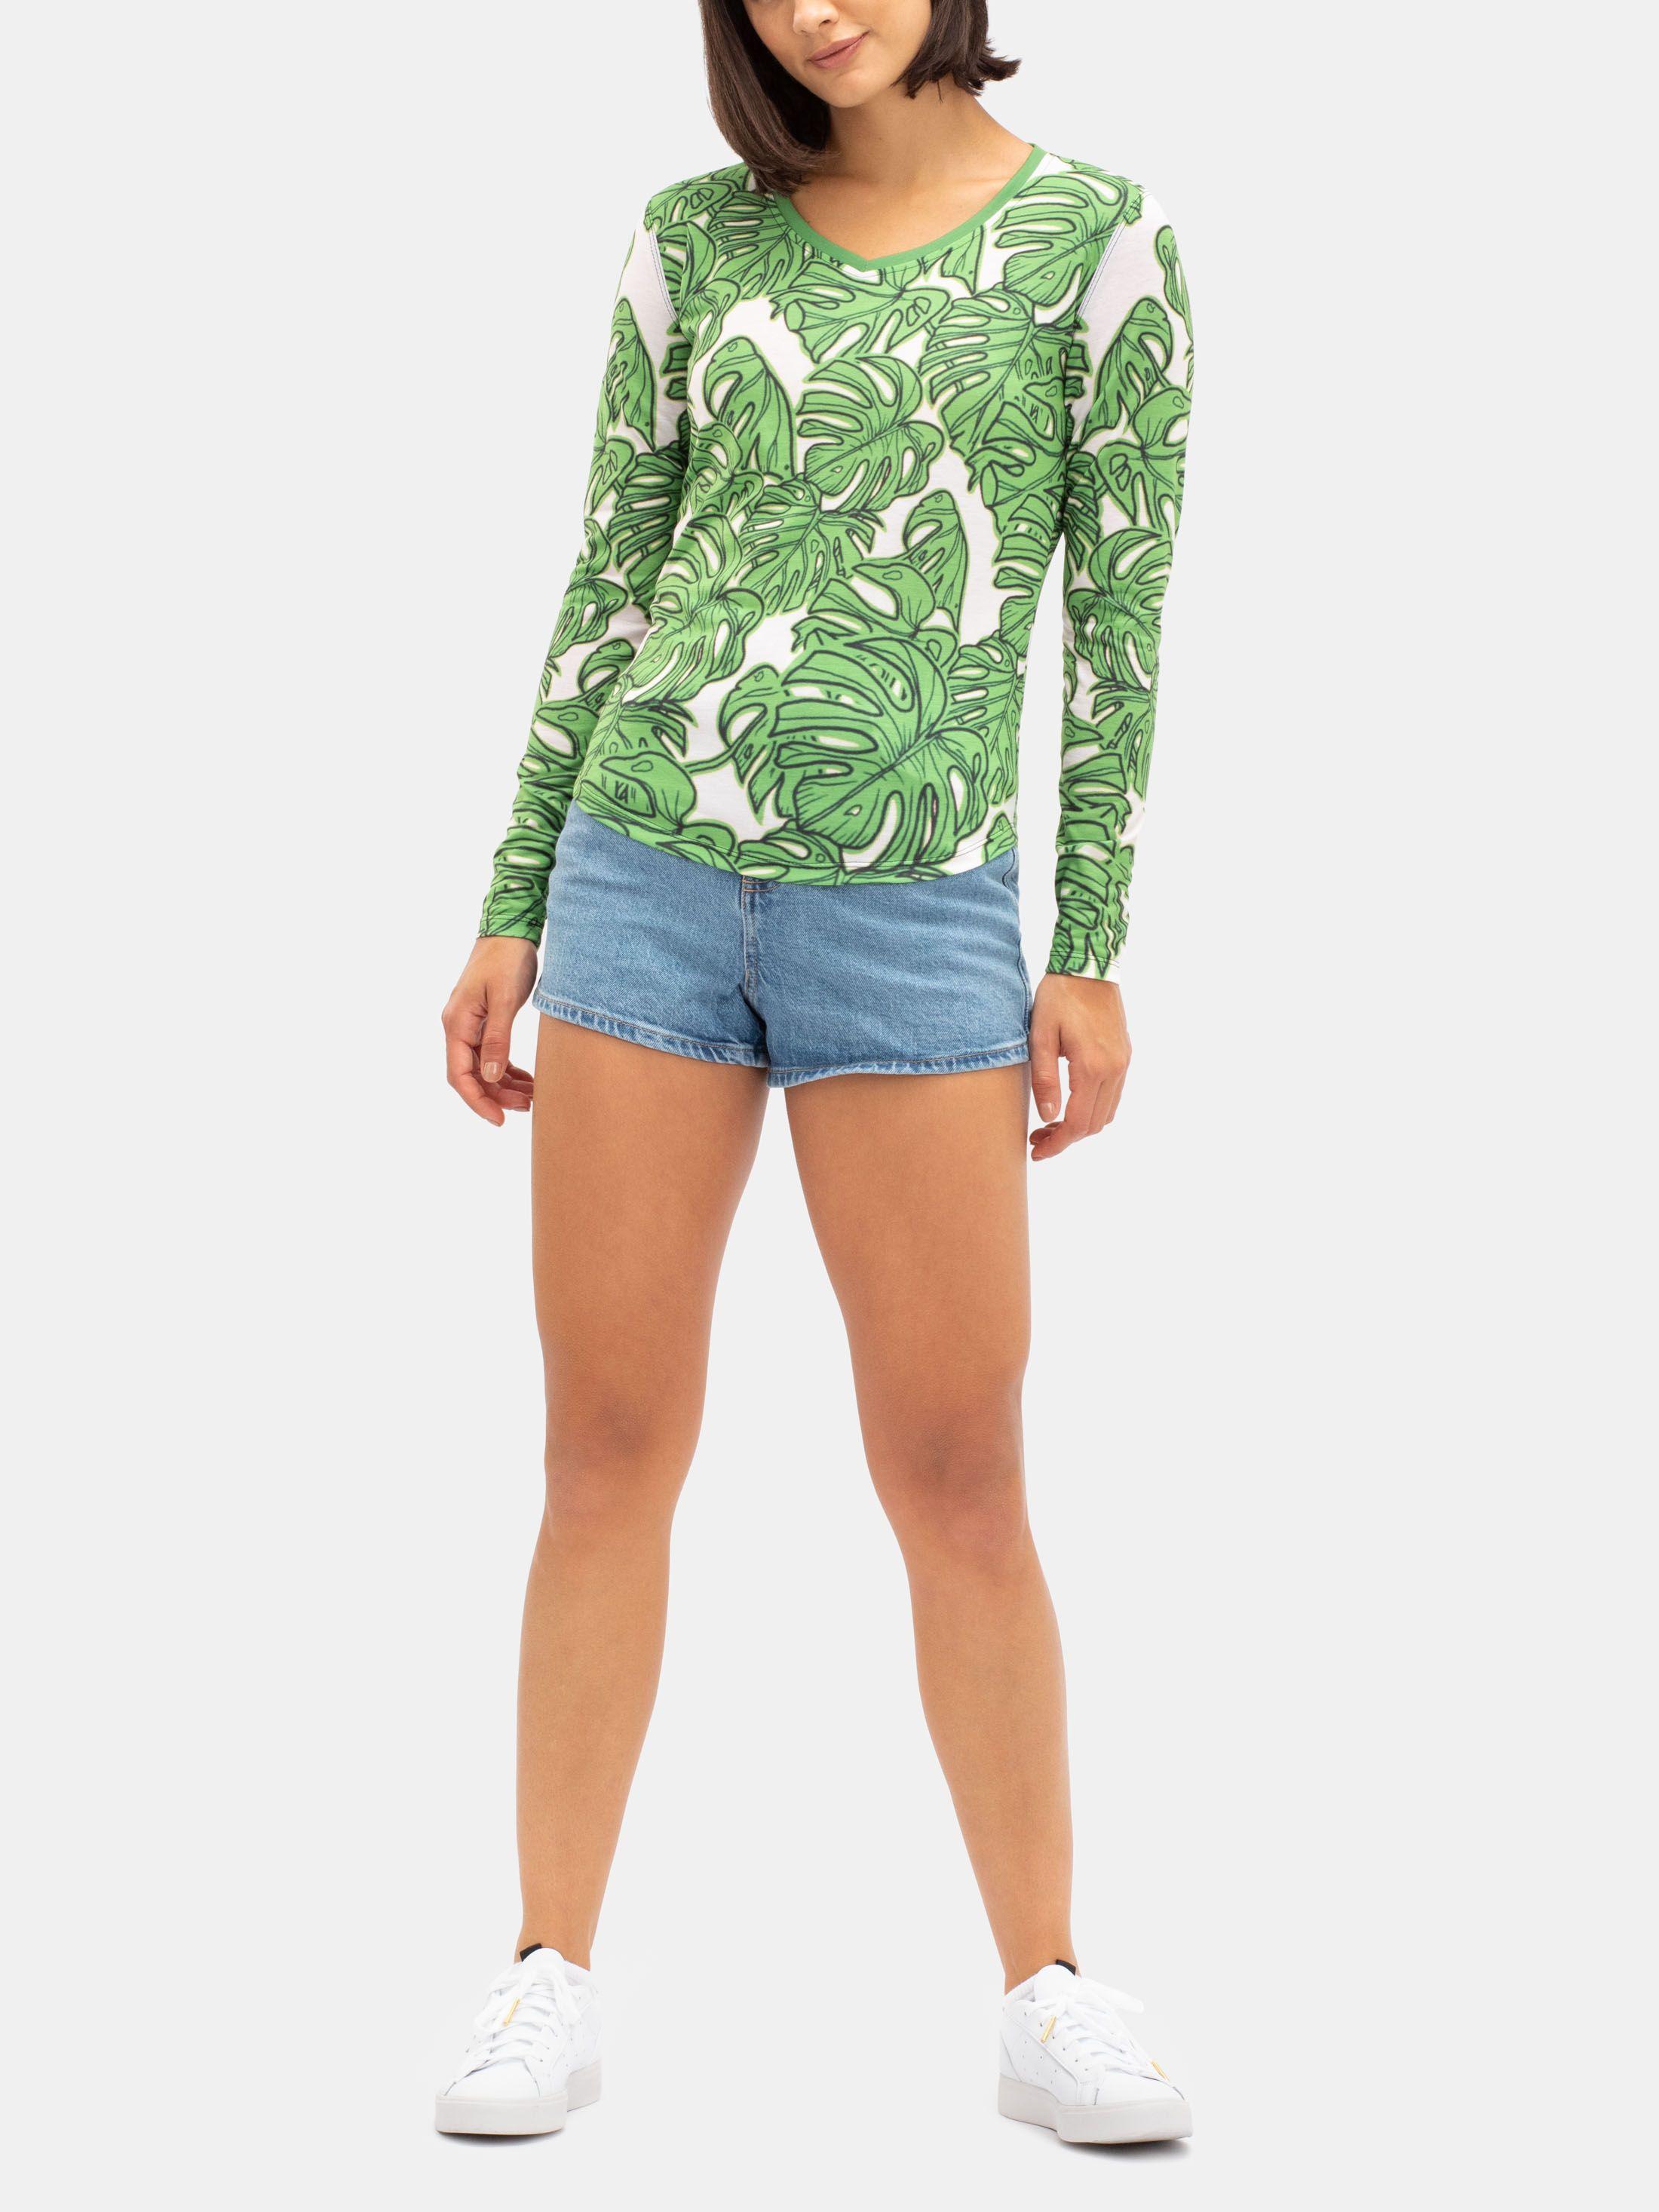 Women's Personalised Eco Long Sleeve T-Shirt